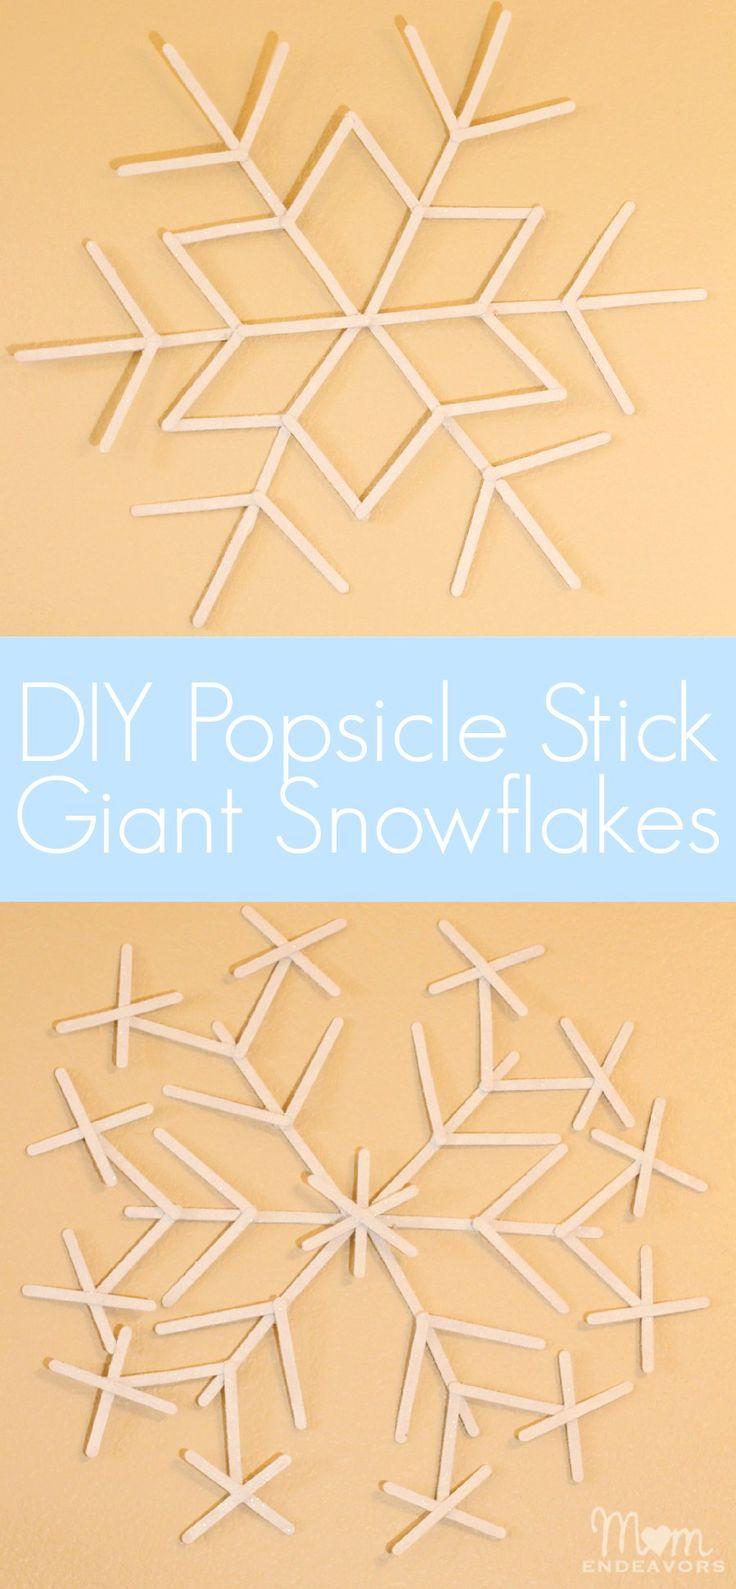 Stick pins for crafts - Stick Pins For Crafts 53